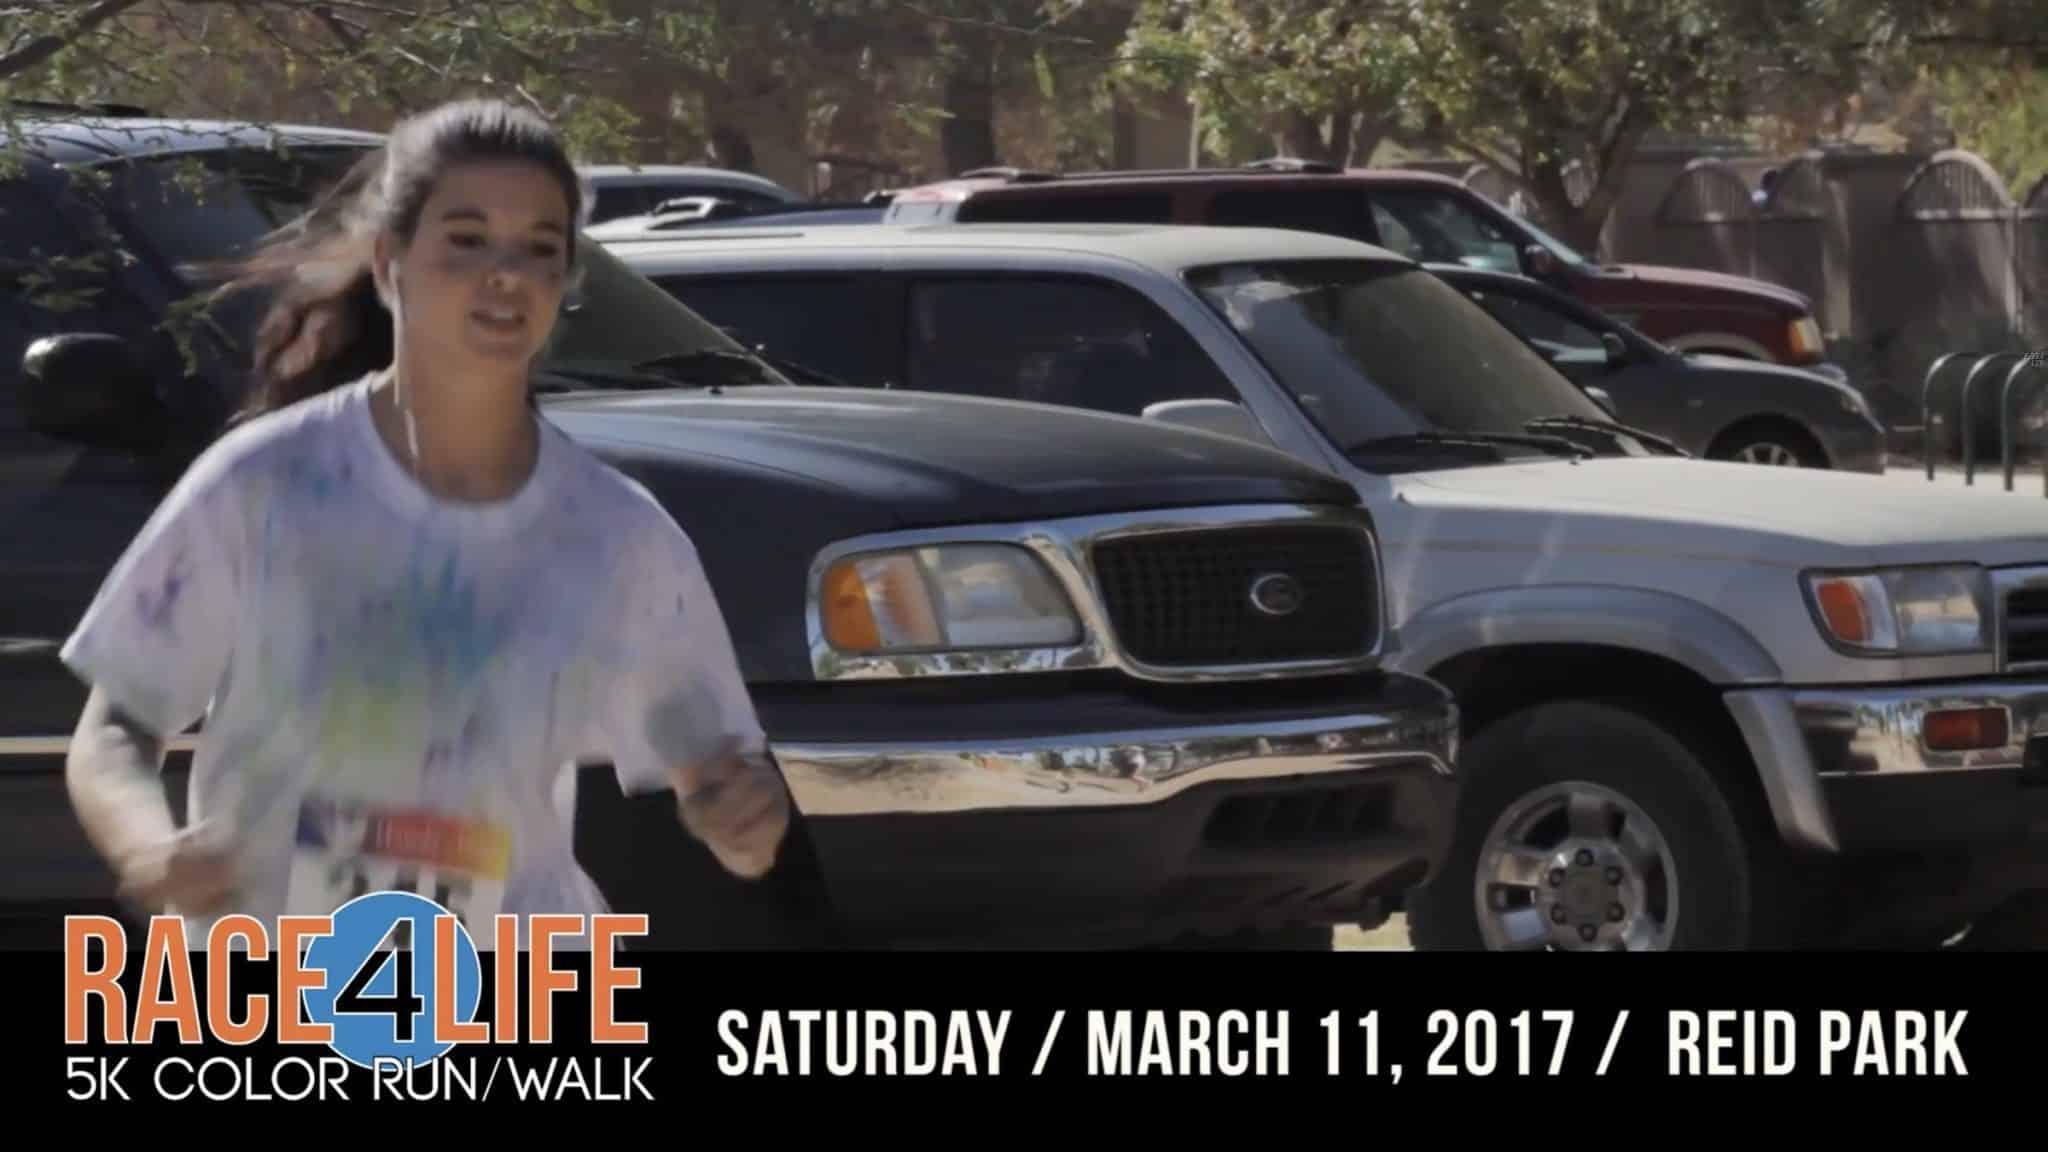 race4life-video-promo Materials